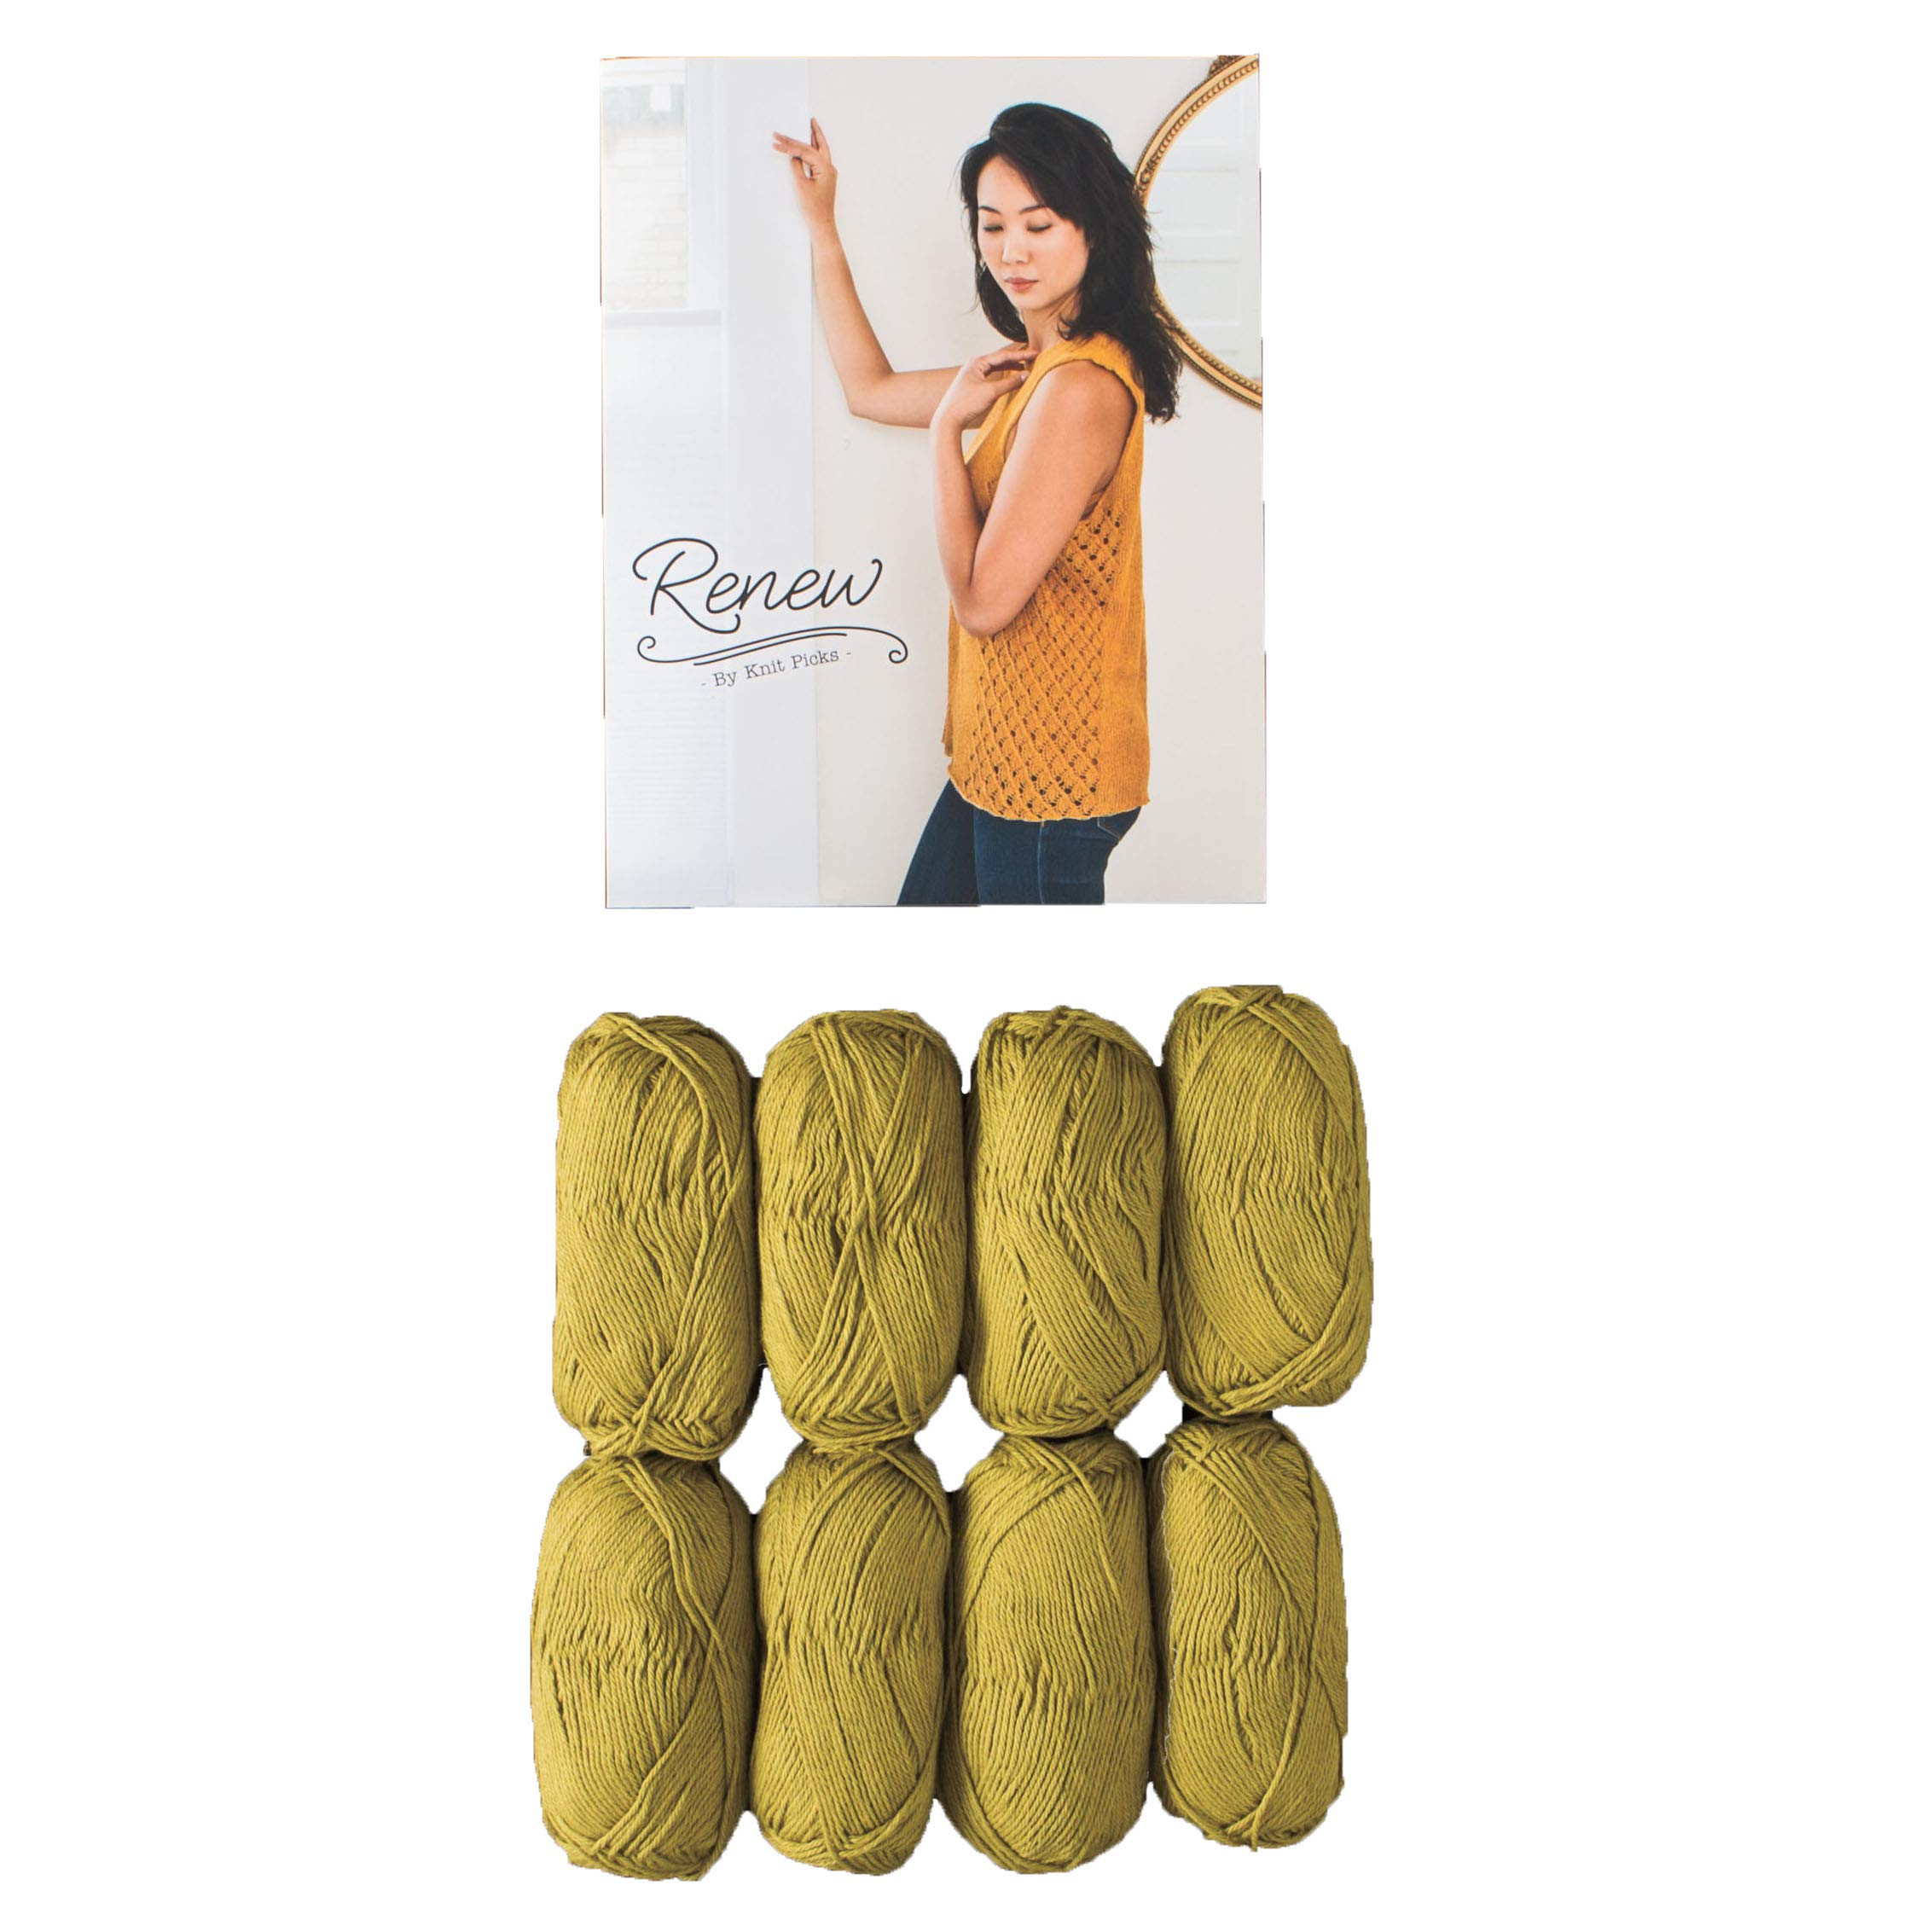 Knit Picks Cotton Garment Knitting Pattern Kit (Cloverleaf Top)